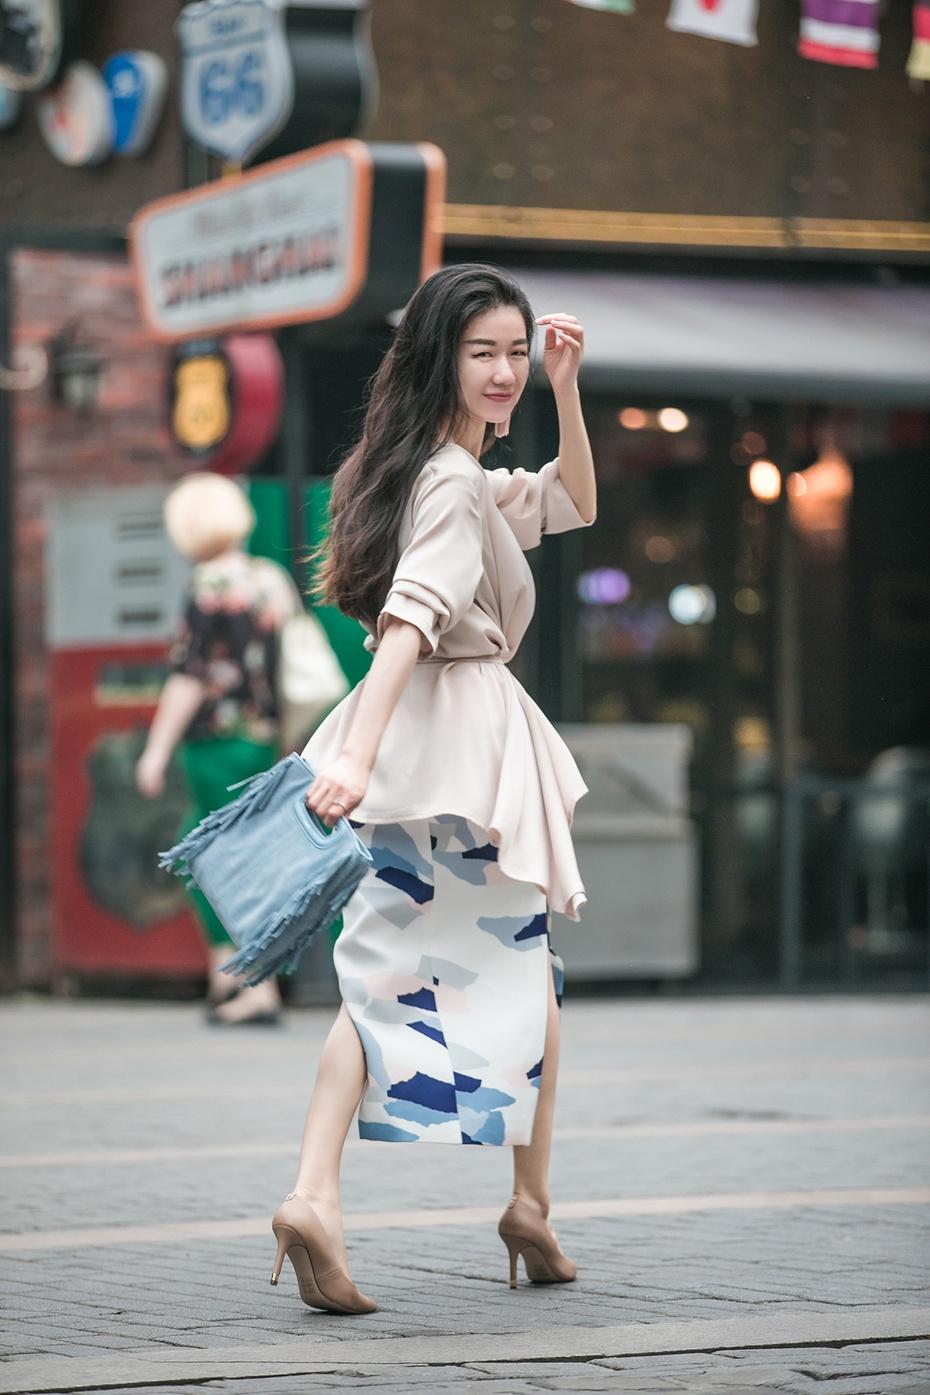 [Ava搭配周记]别让你的穿搭被一眼看穿! - AvaFoo - Avas Fashion Blog